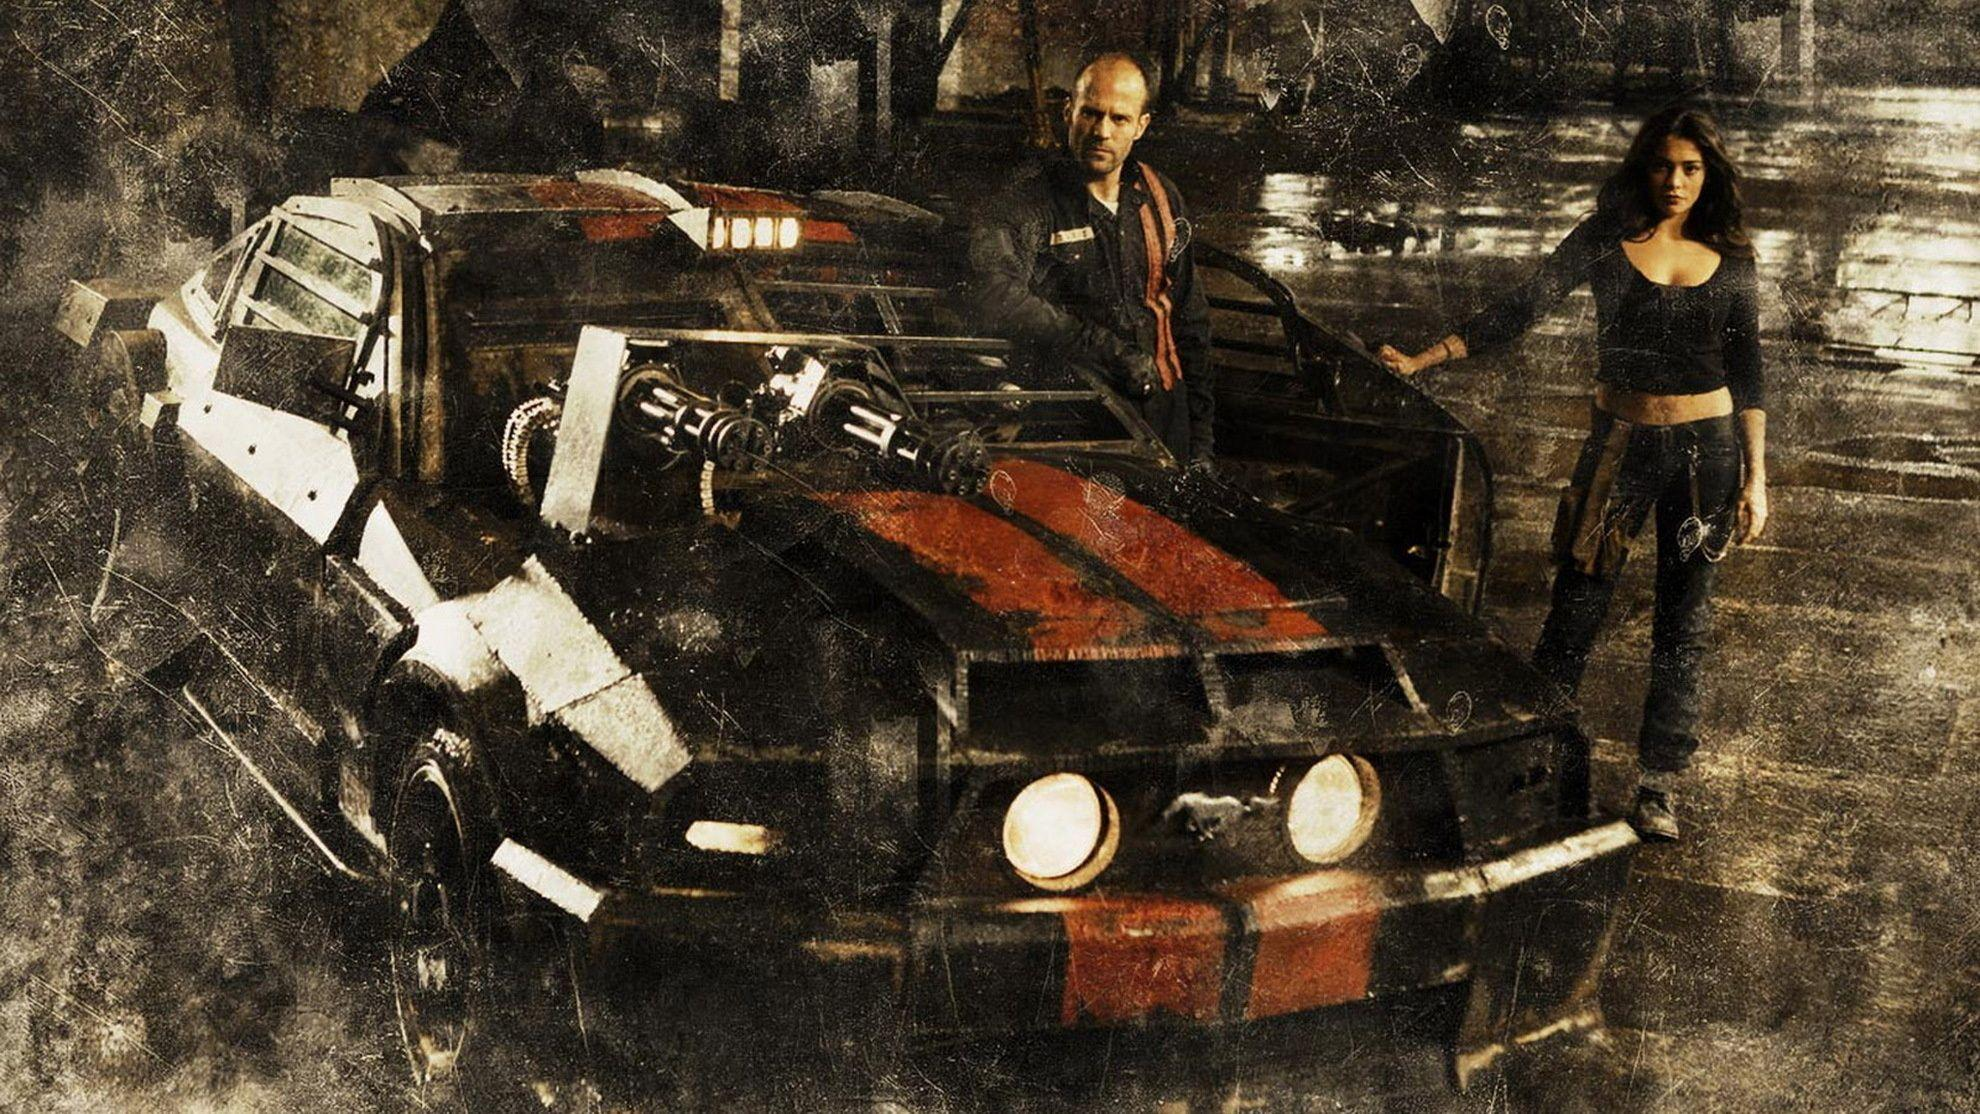 Mustang Death Race Cars Picture Idokeren